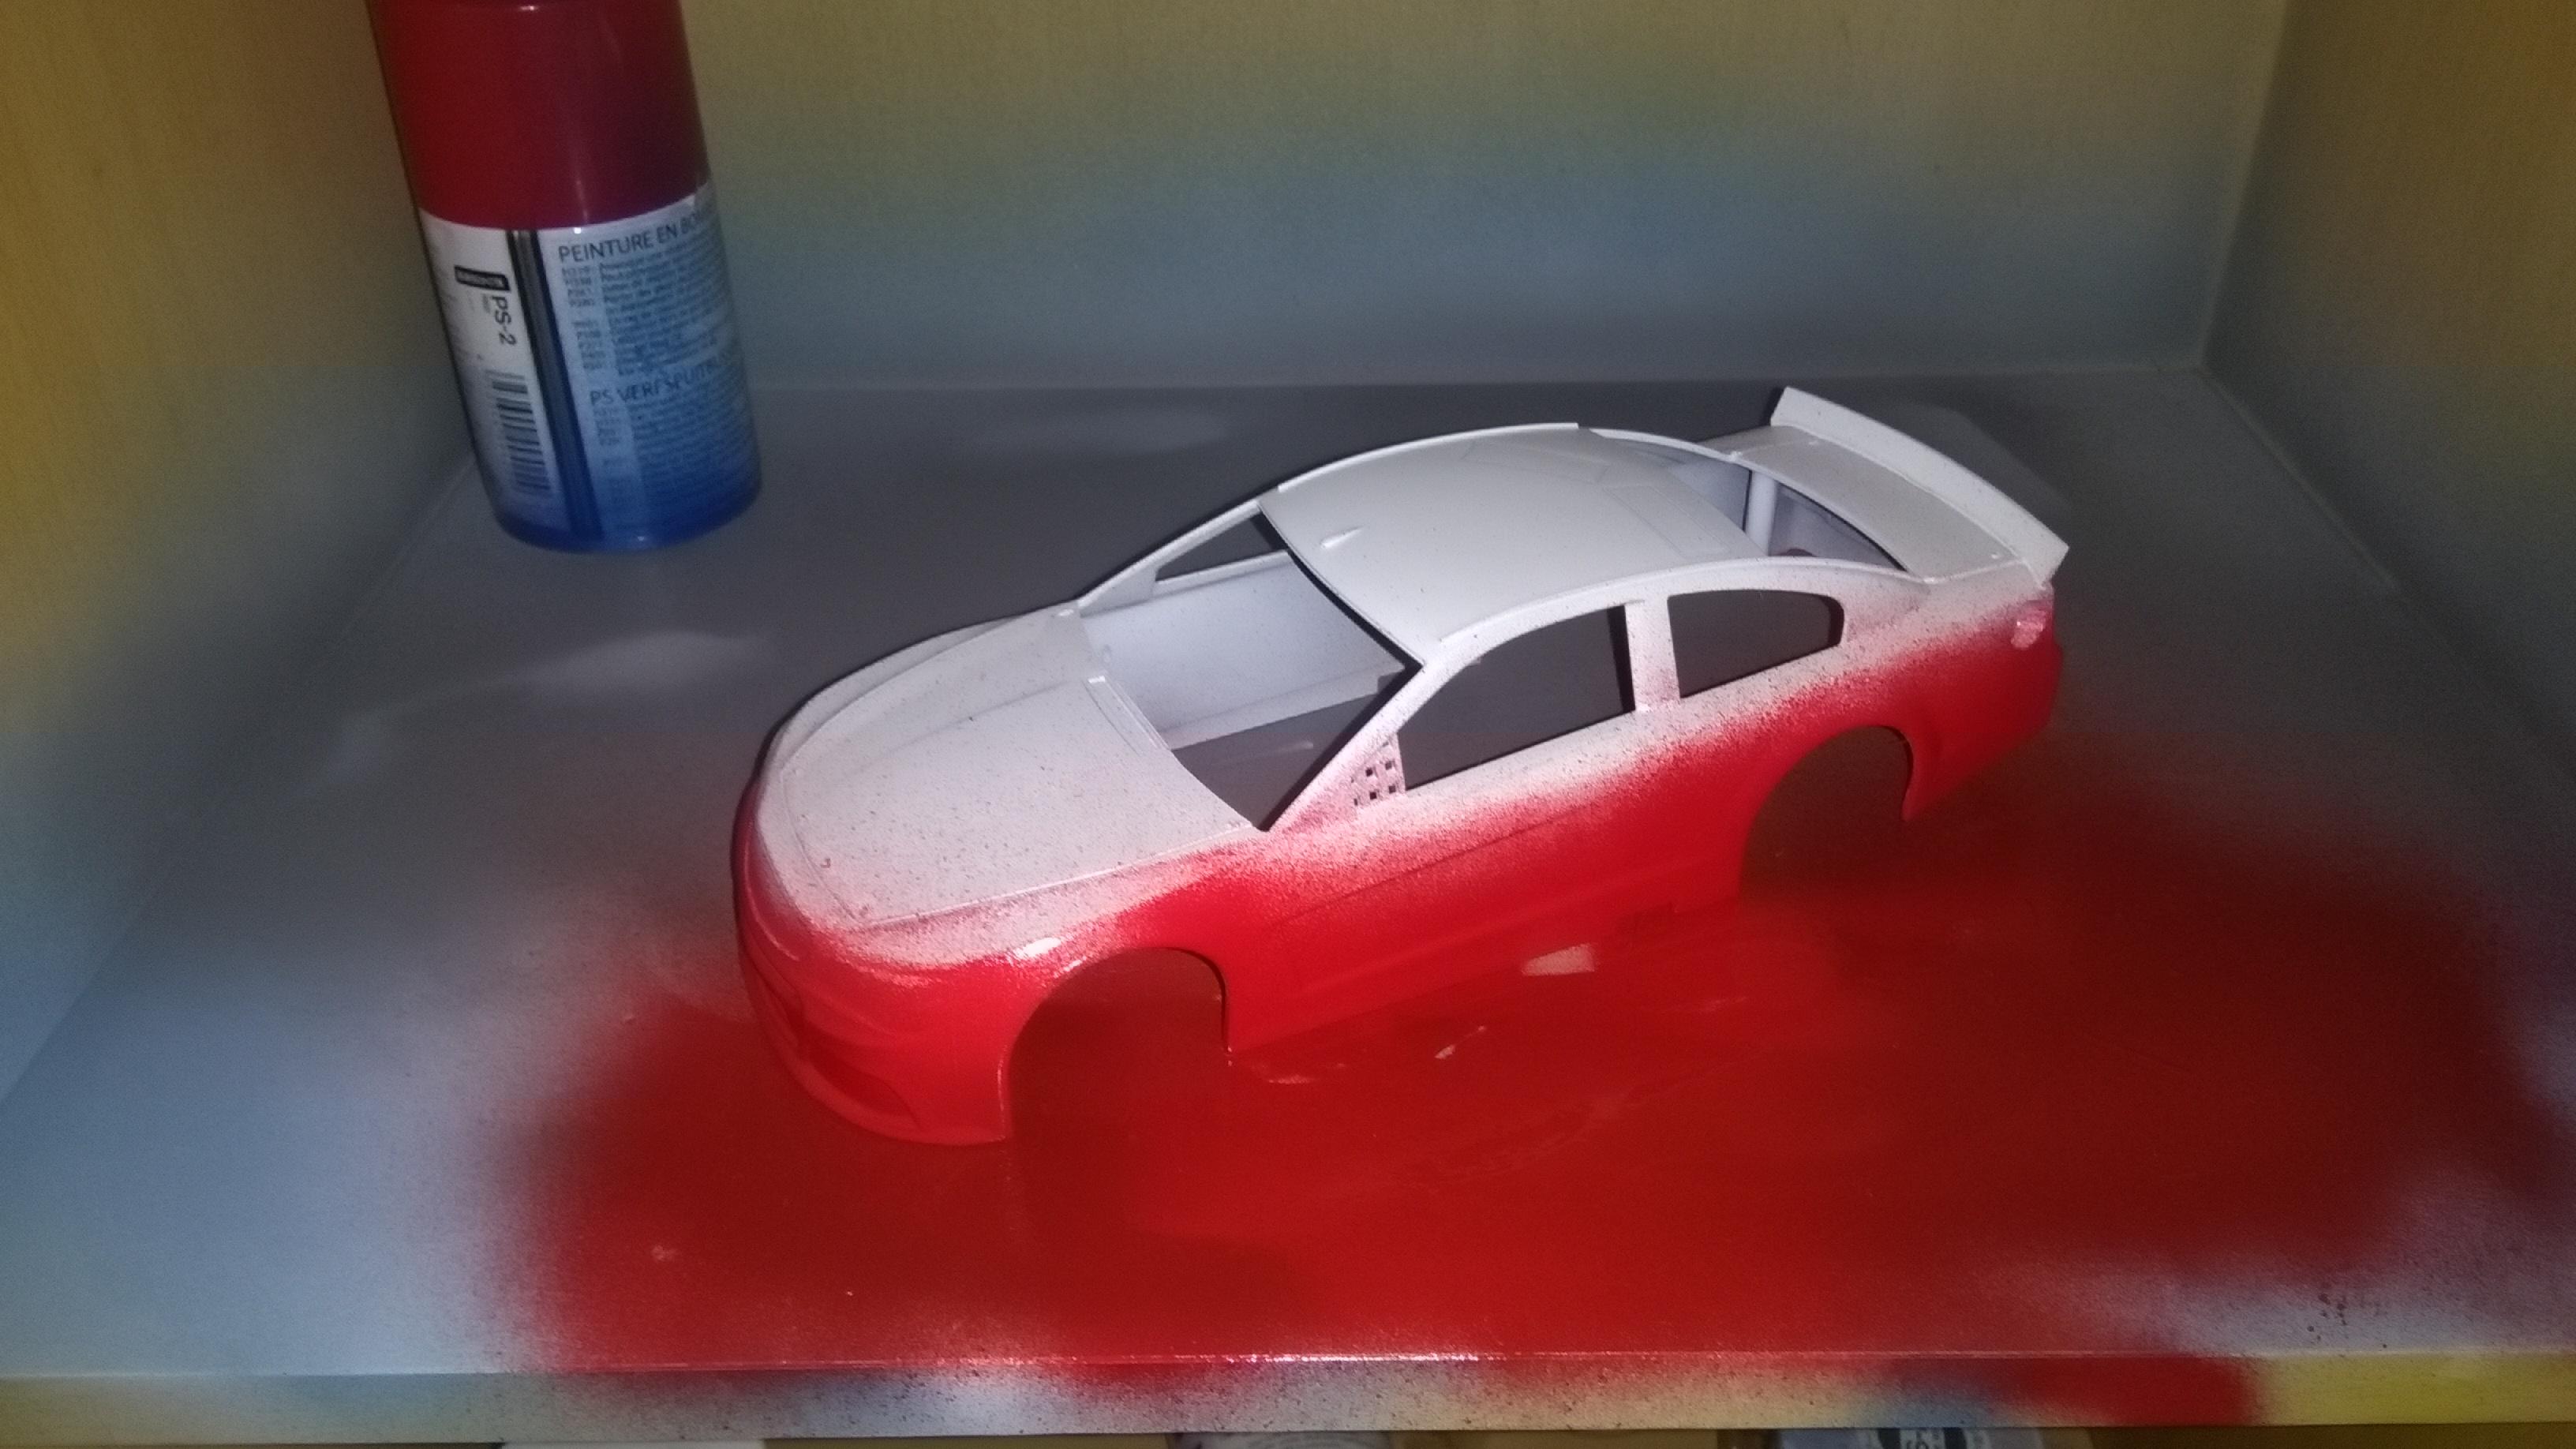 Chevrolet SS 2015 #24 Jeff Gordon 3M 914109IMG20170316172718